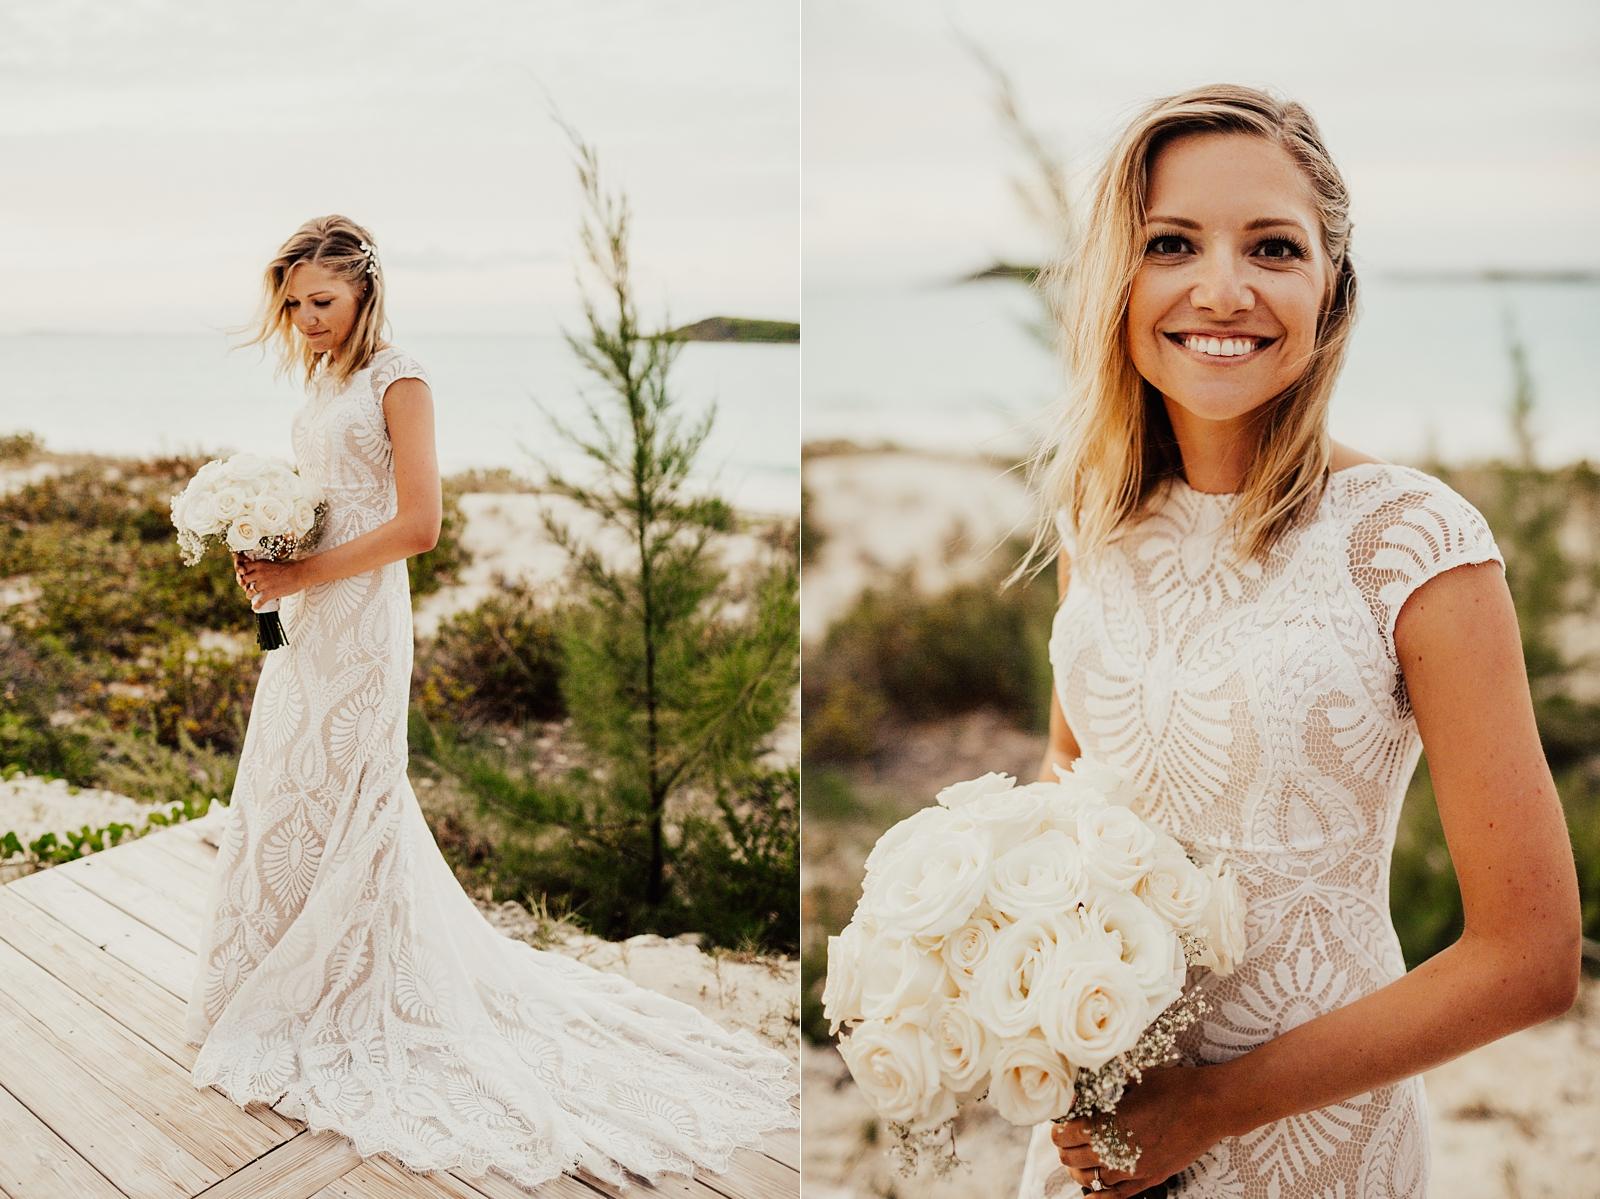 Jenni & Andrew Intimate Beach Destination Wedding in Little Exuma, Bahamas_0530.jpg